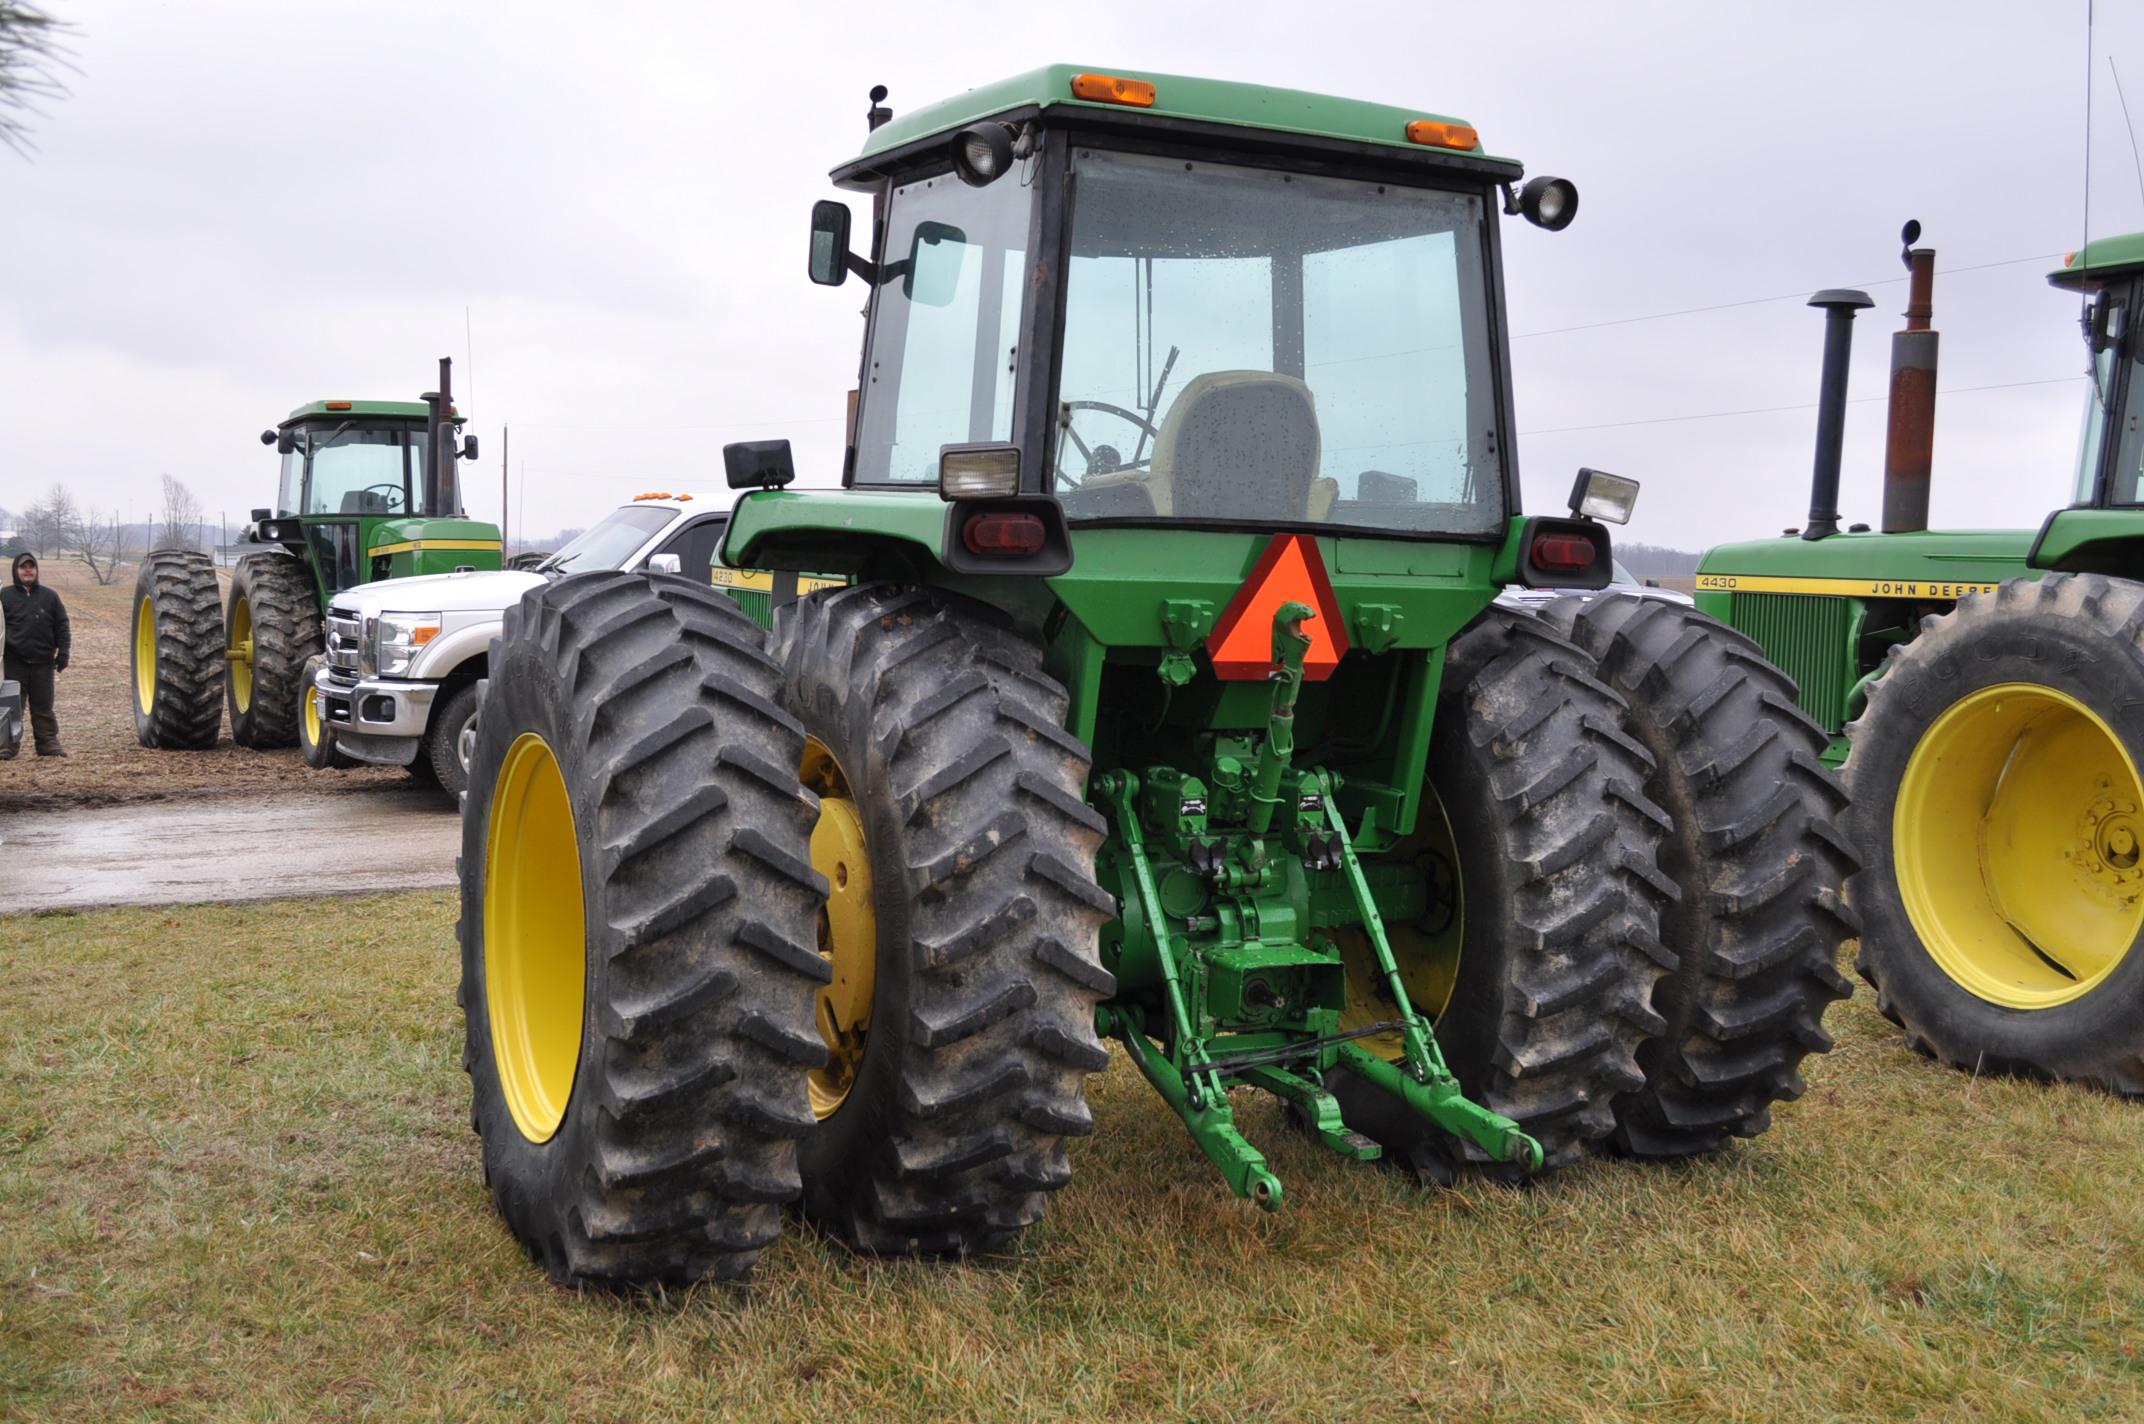 John Deere 4230 tractor, diesel, 18.4-34 hub duals, 10.00-16 front, CHA, Quad range, 2 hyd - Image 2 of 23